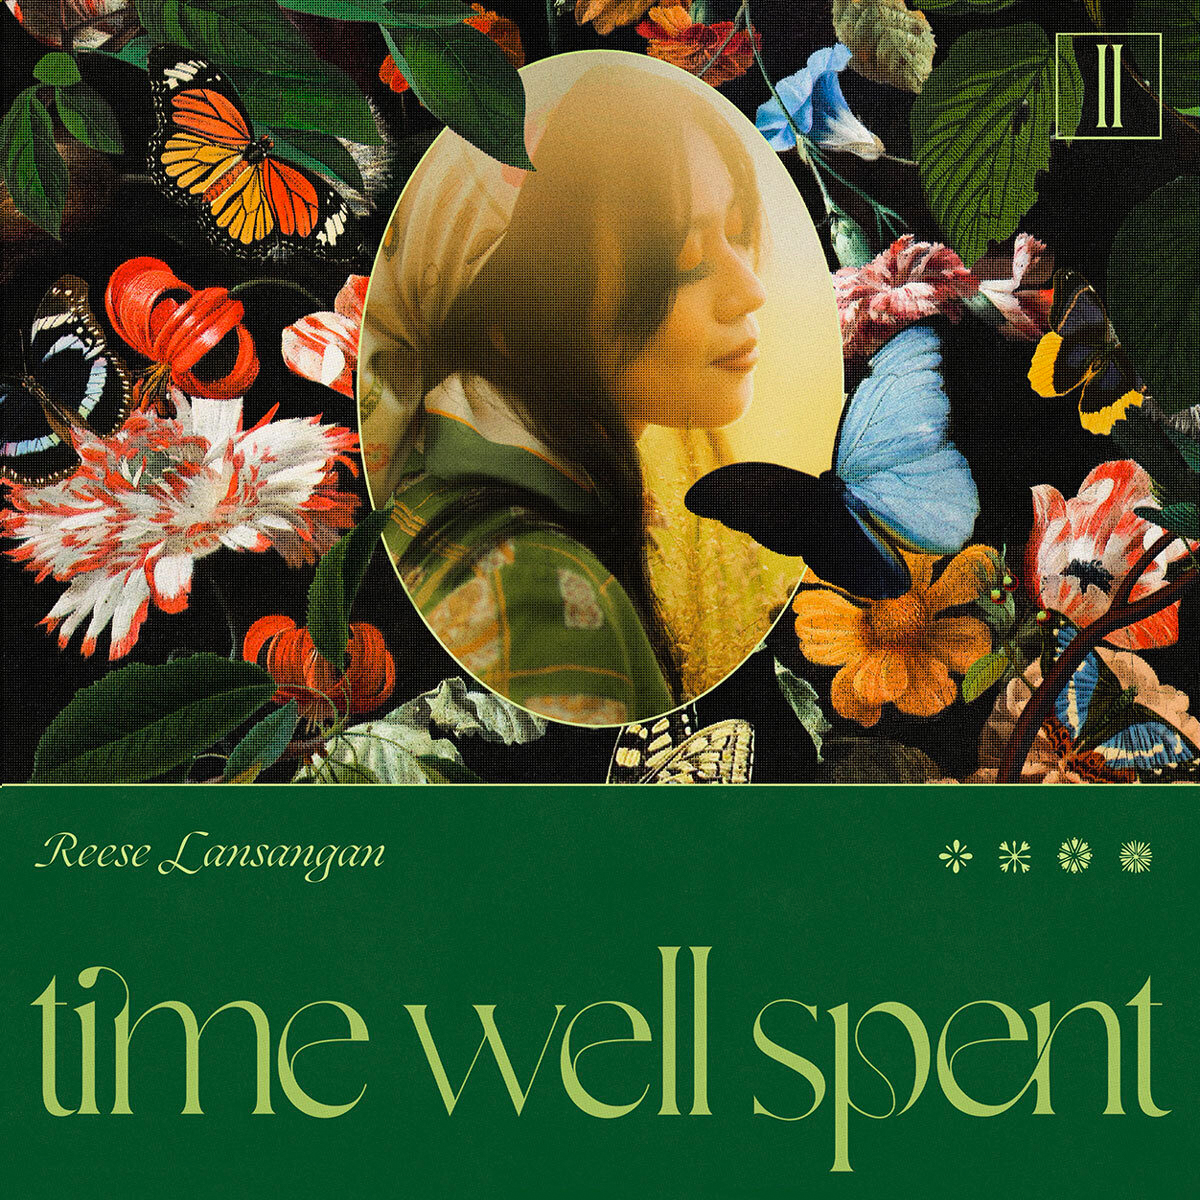 Reese Lansangan 2021 album Time Well Spent